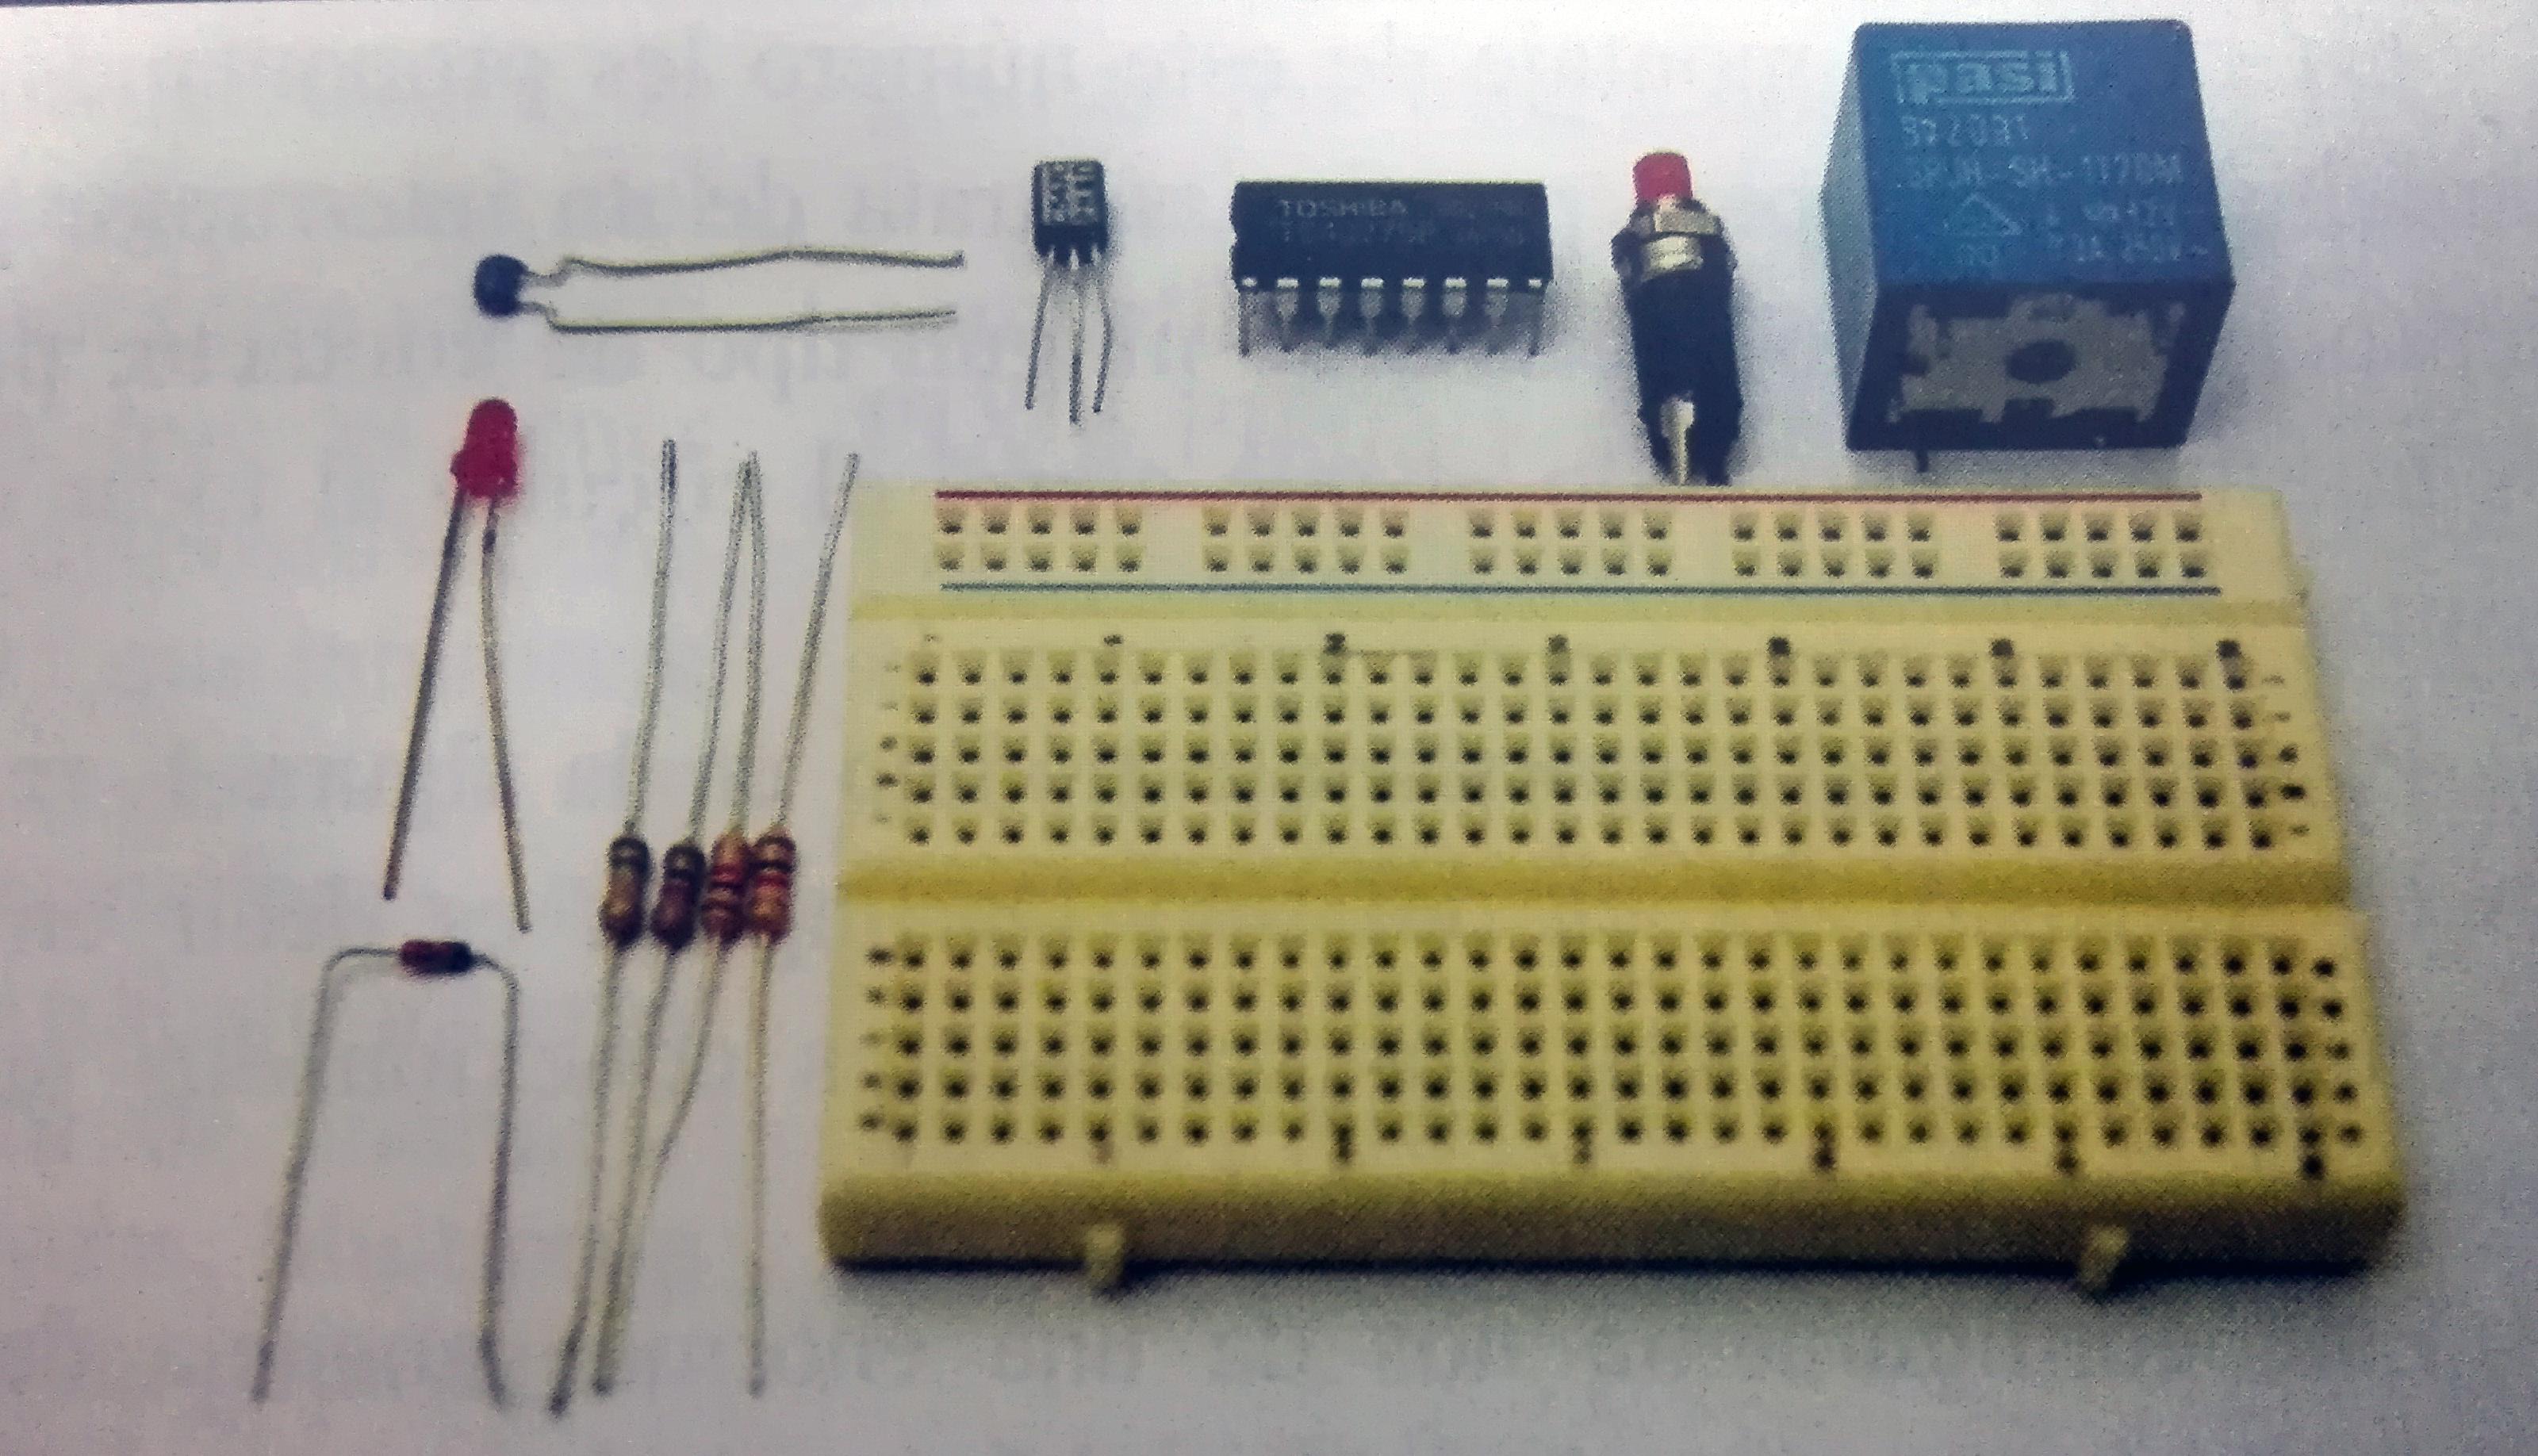 todoelectronica electronics course